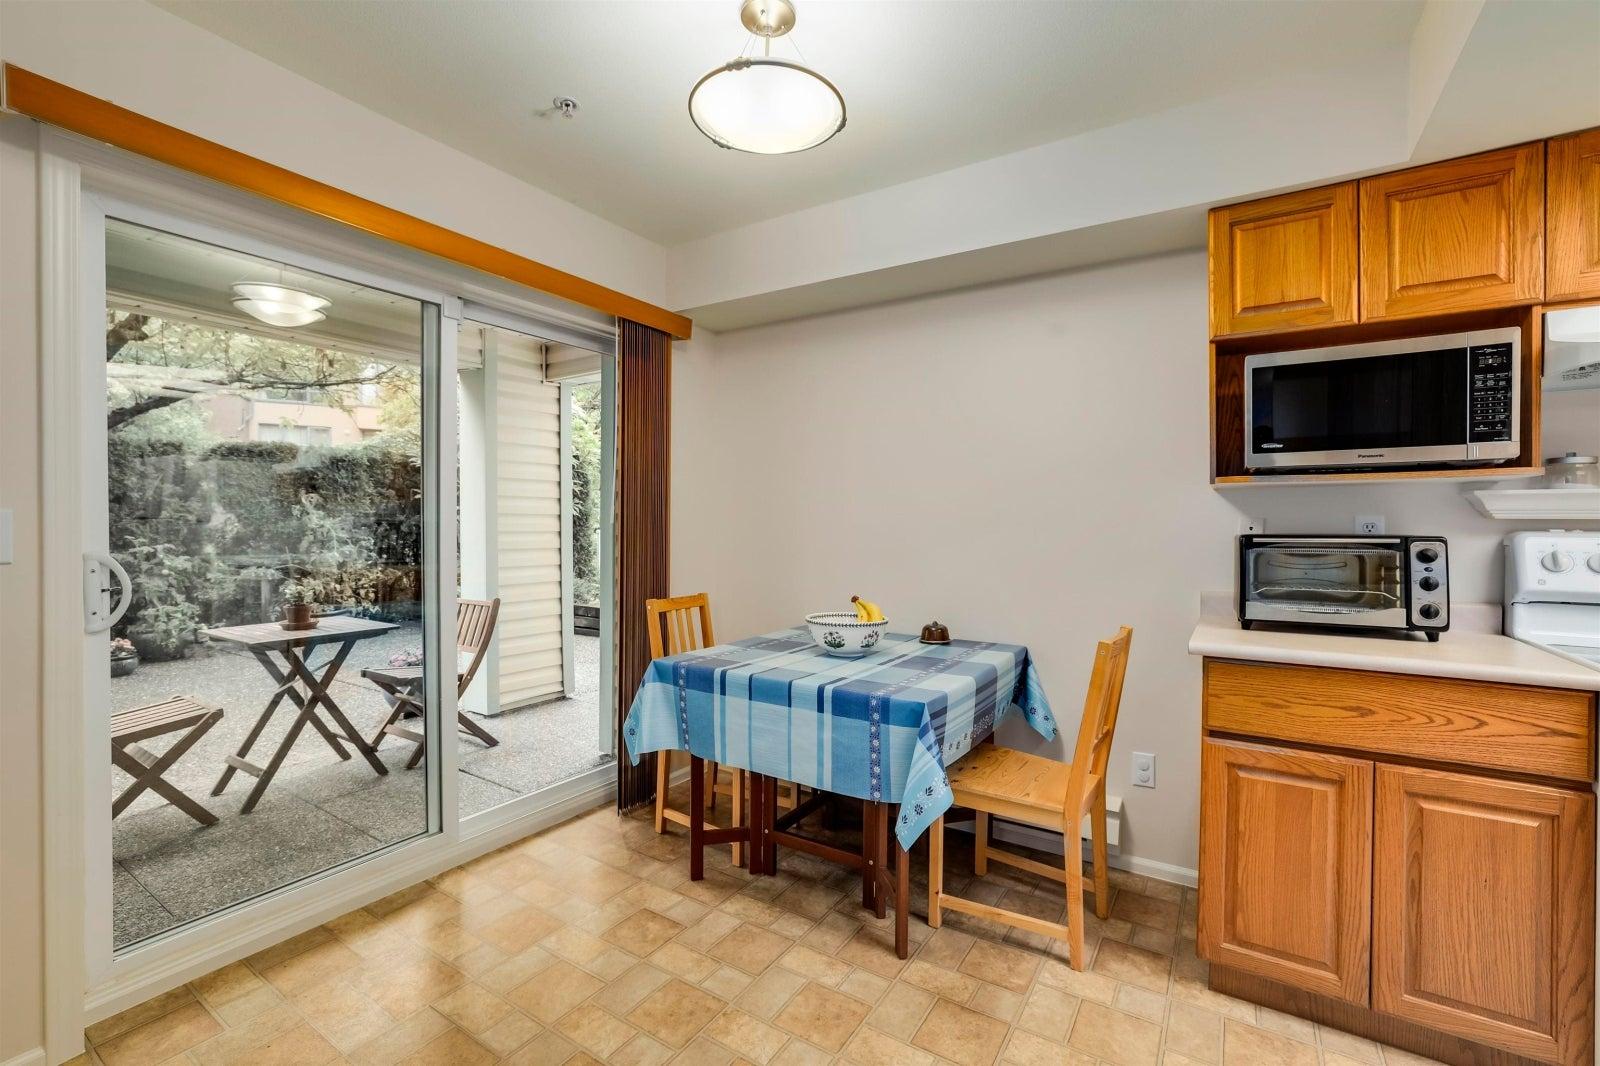 103 1132 DUFFERIN STREET - Eagle Ridge CQ Apartment/Condo for sale, 2 Bedrooms (R2618654) #11